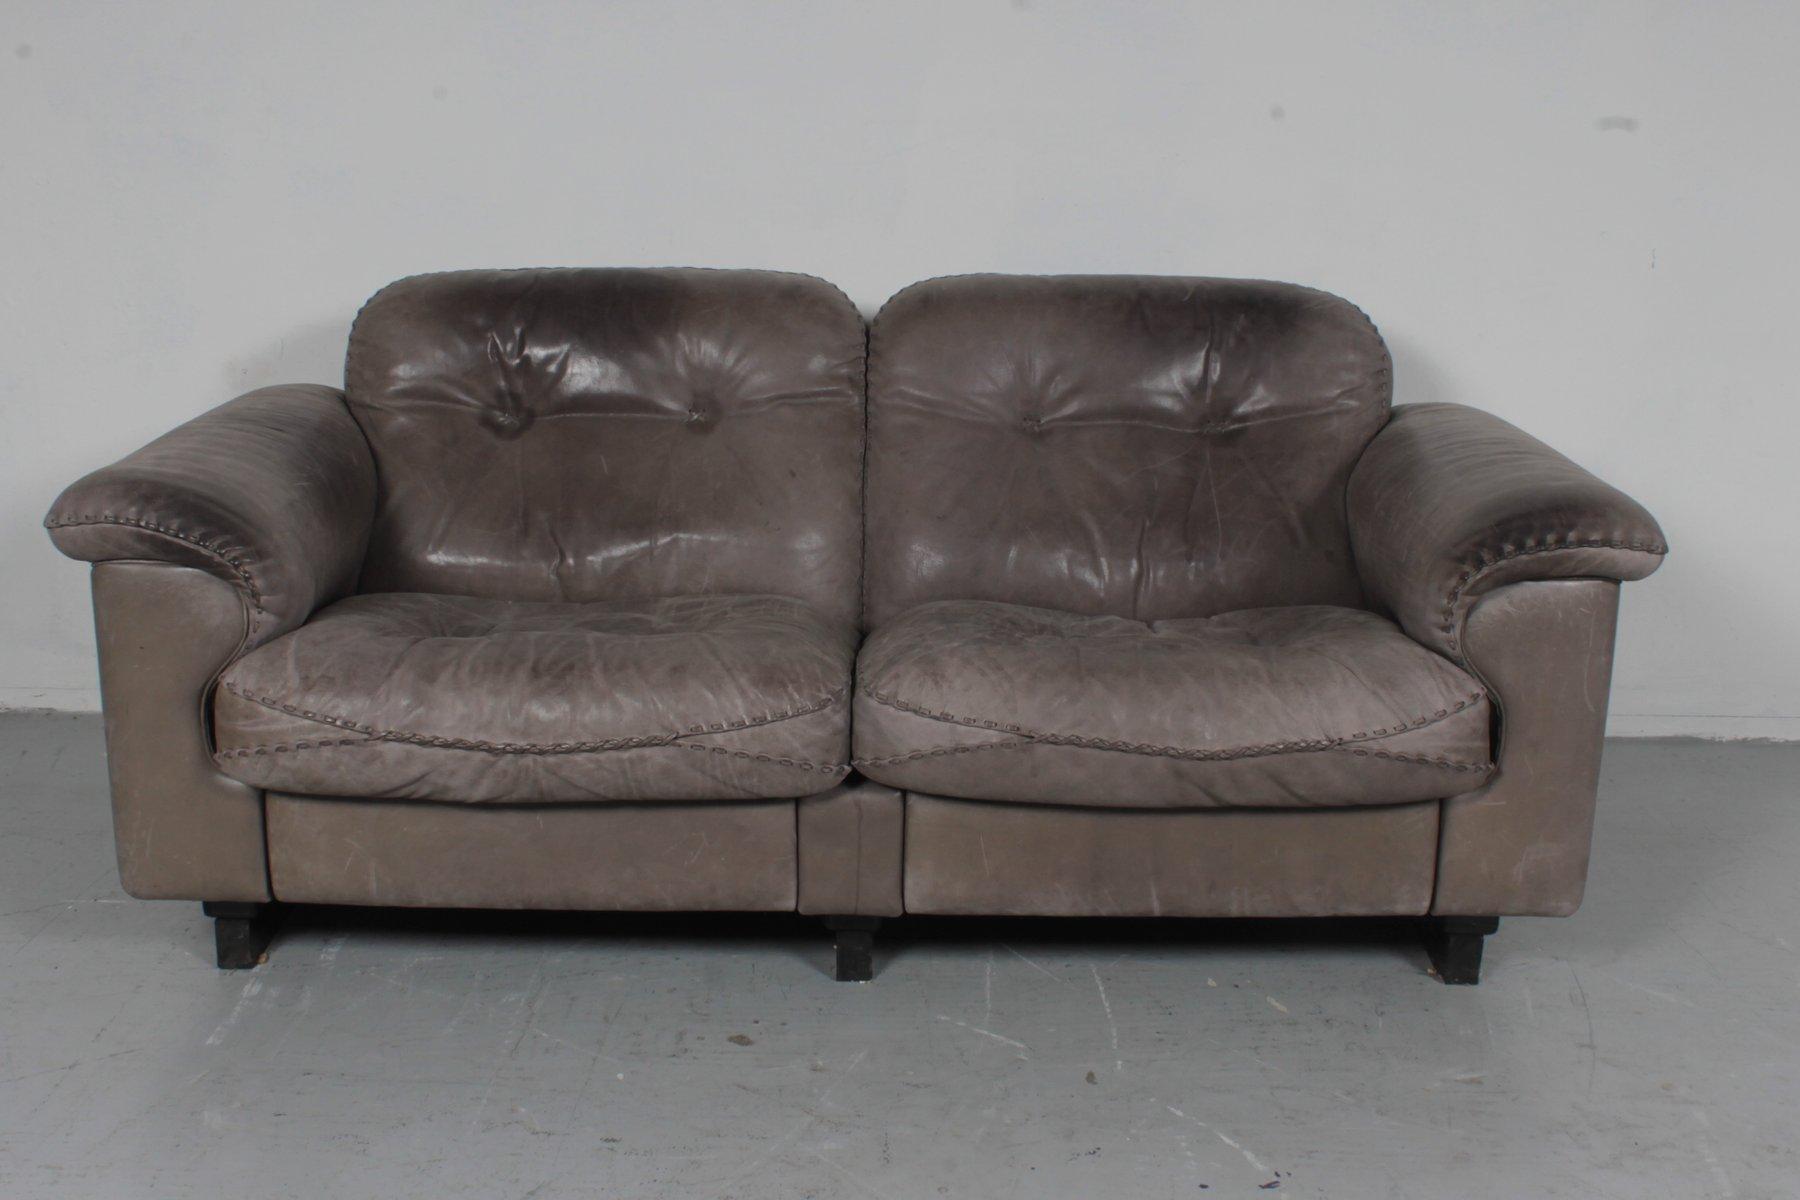 ds101 2 sitzer sofa von de sede 1970er bei pamono kaufen. Black Bedroom Furniture Sets. Home Design Ideas